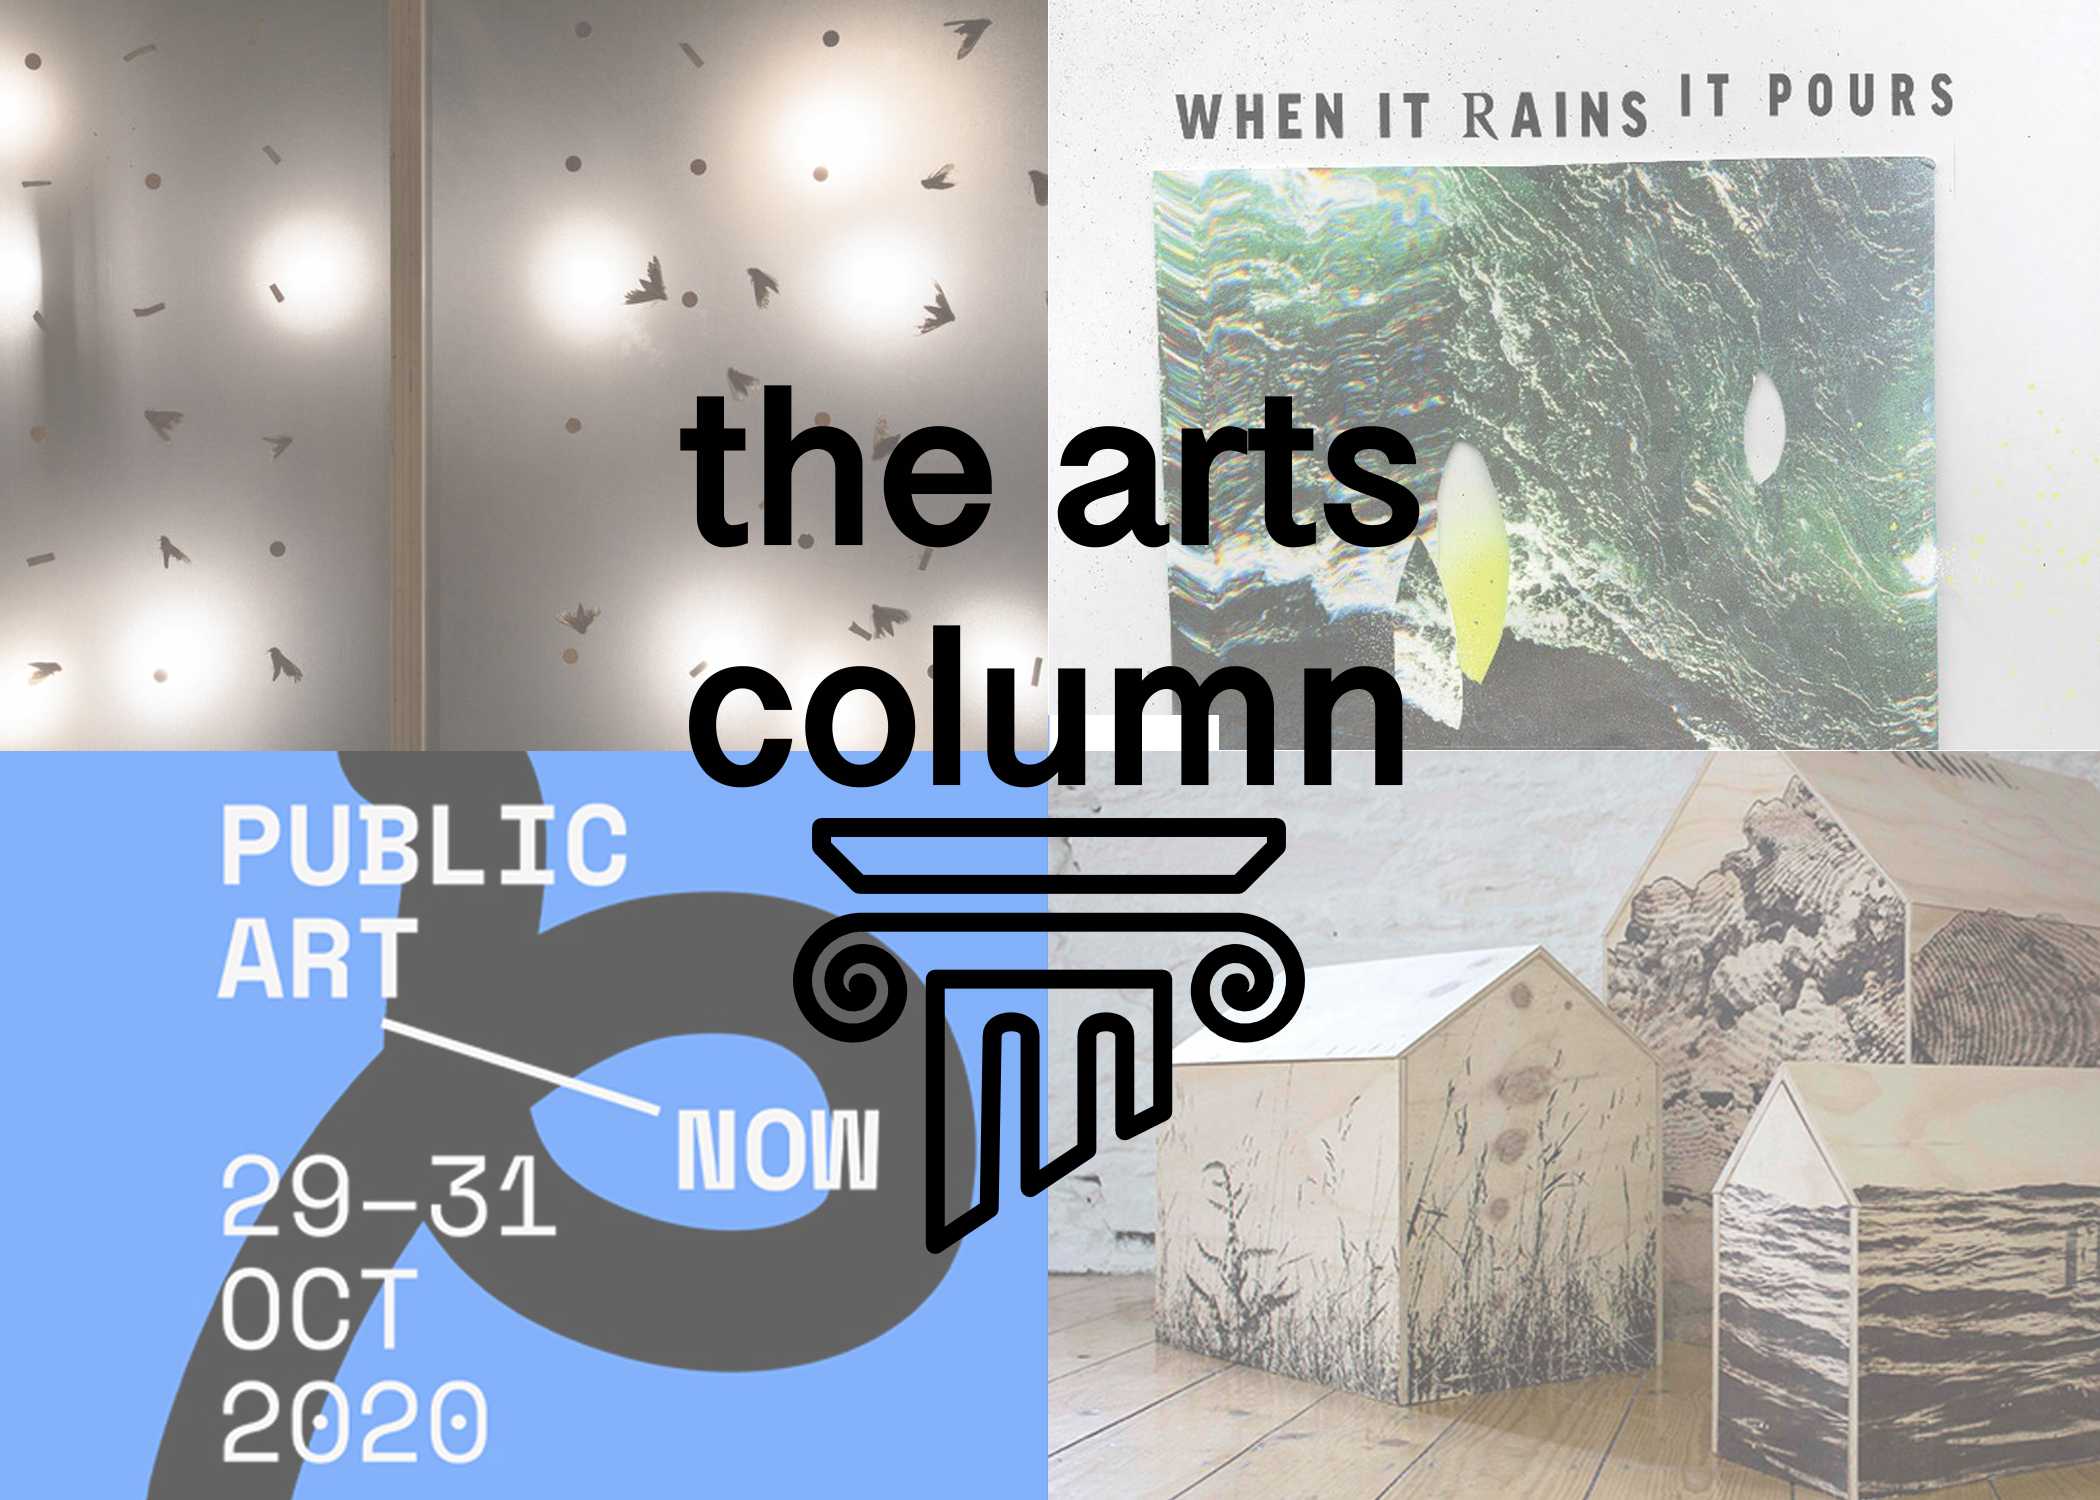 the_arts_column_34